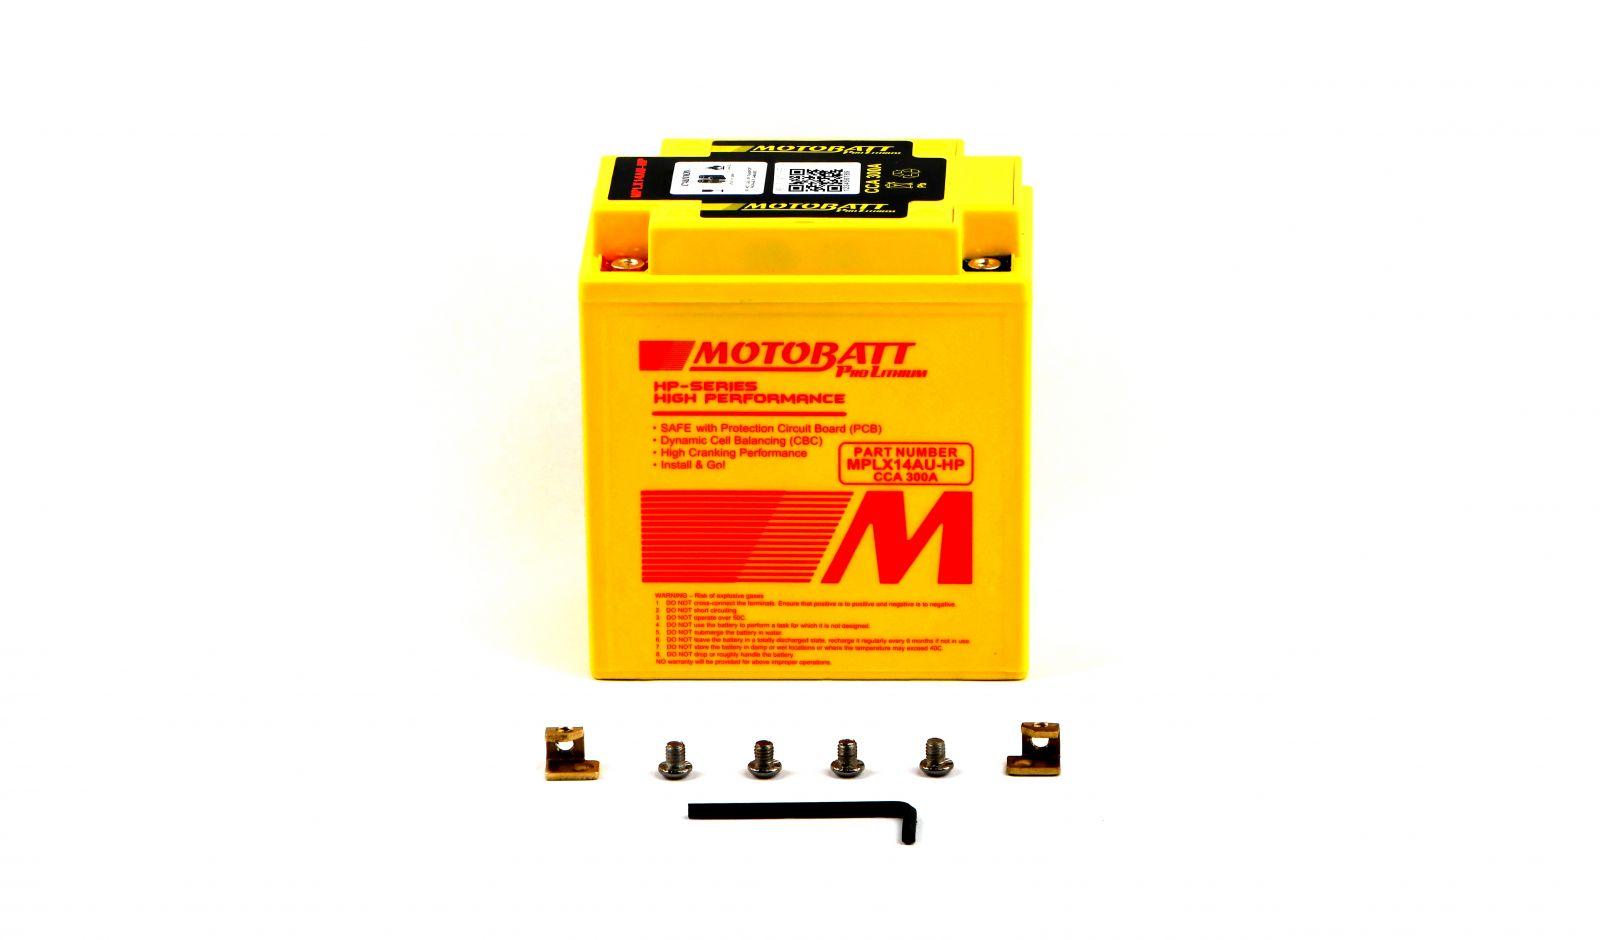 Motobatt Lithium Batteries - 501142MR image